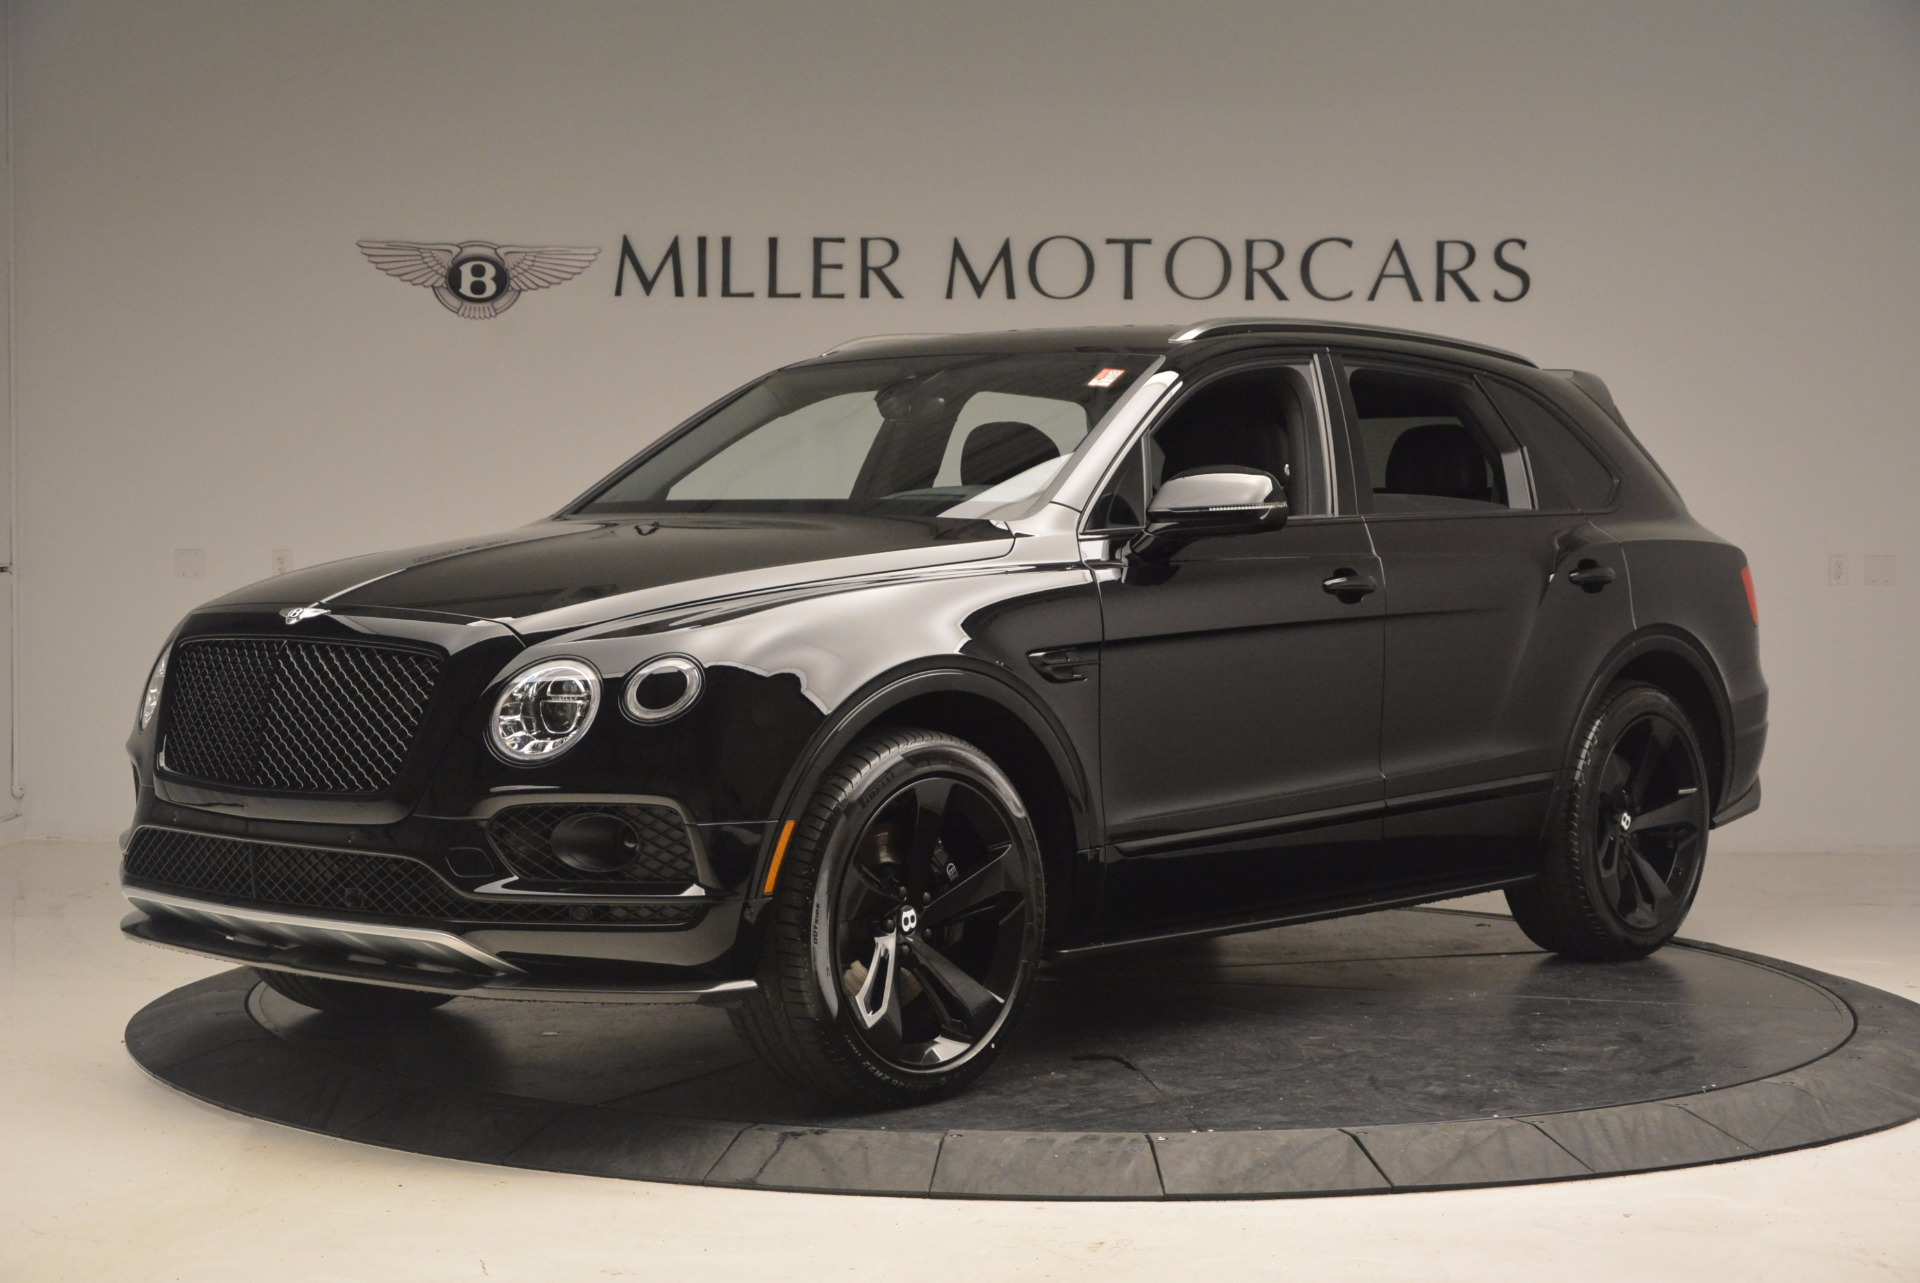 New 2018 Bentley Bentayga Black Edition For Sale Miller Motorcars Stock B1263